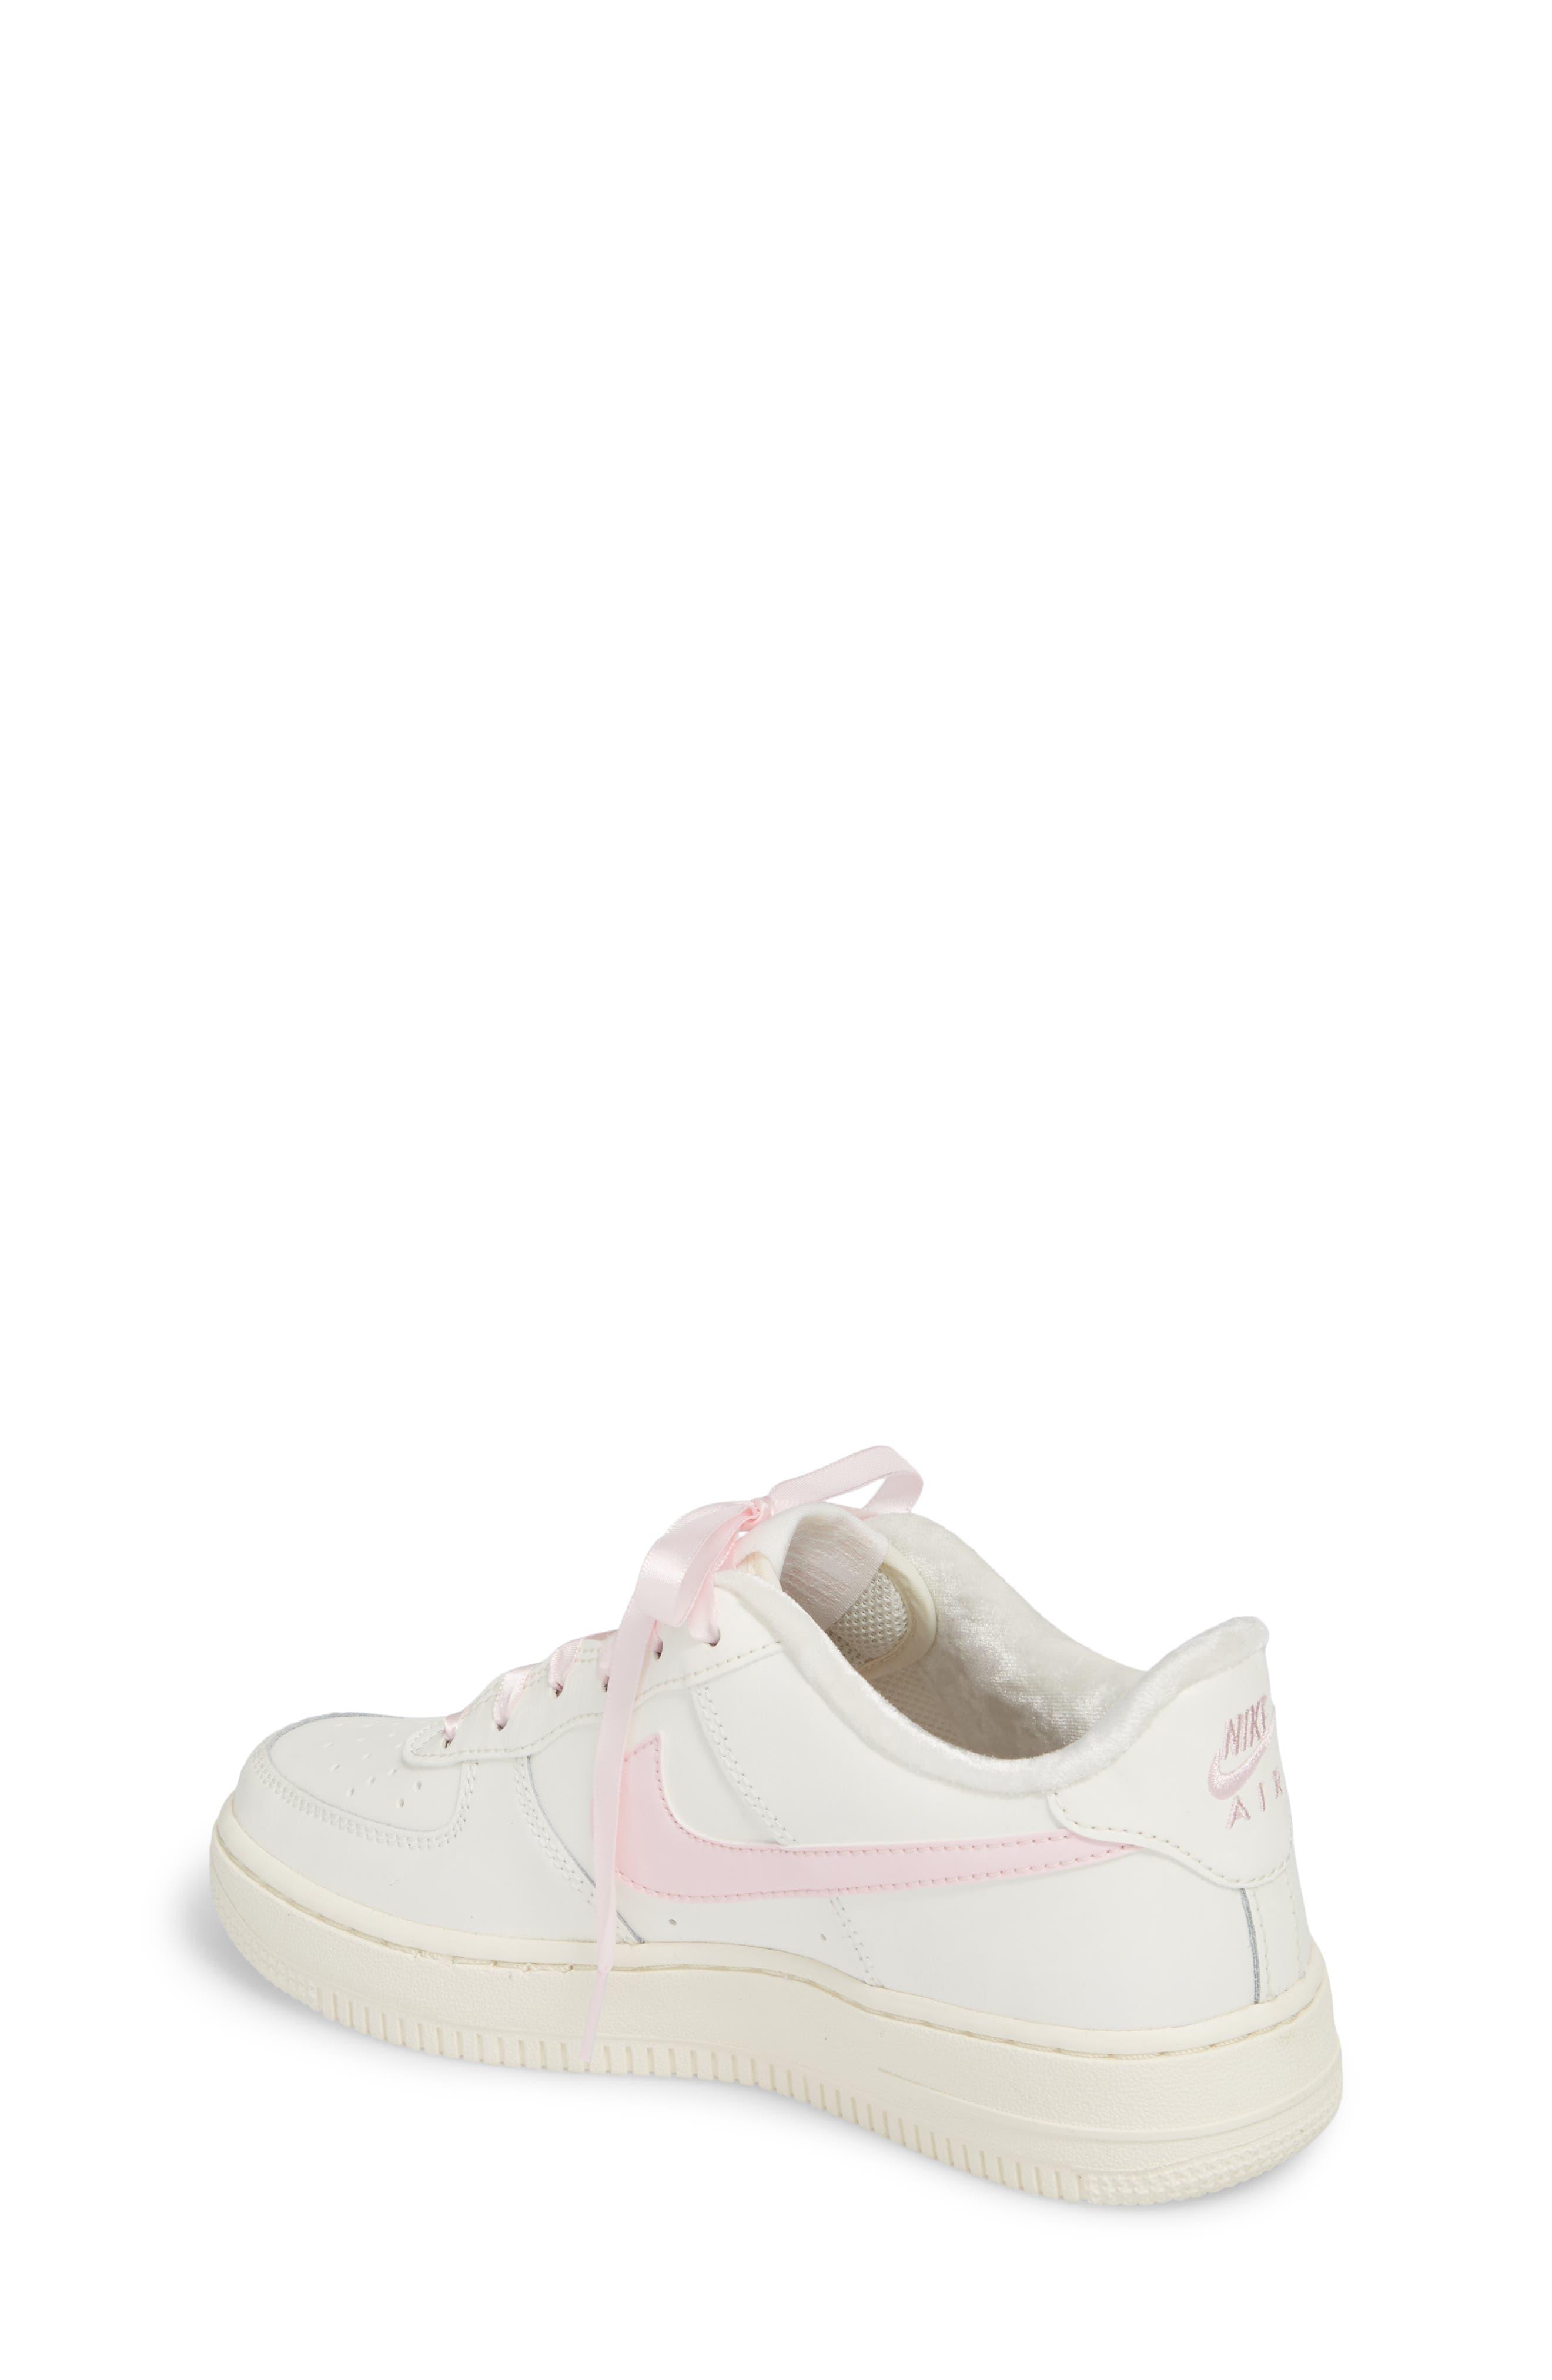 Air Force 1 '06 Sneaker,                             Alternate thumbnail 2, color,                             Sail/ Arctic Pink